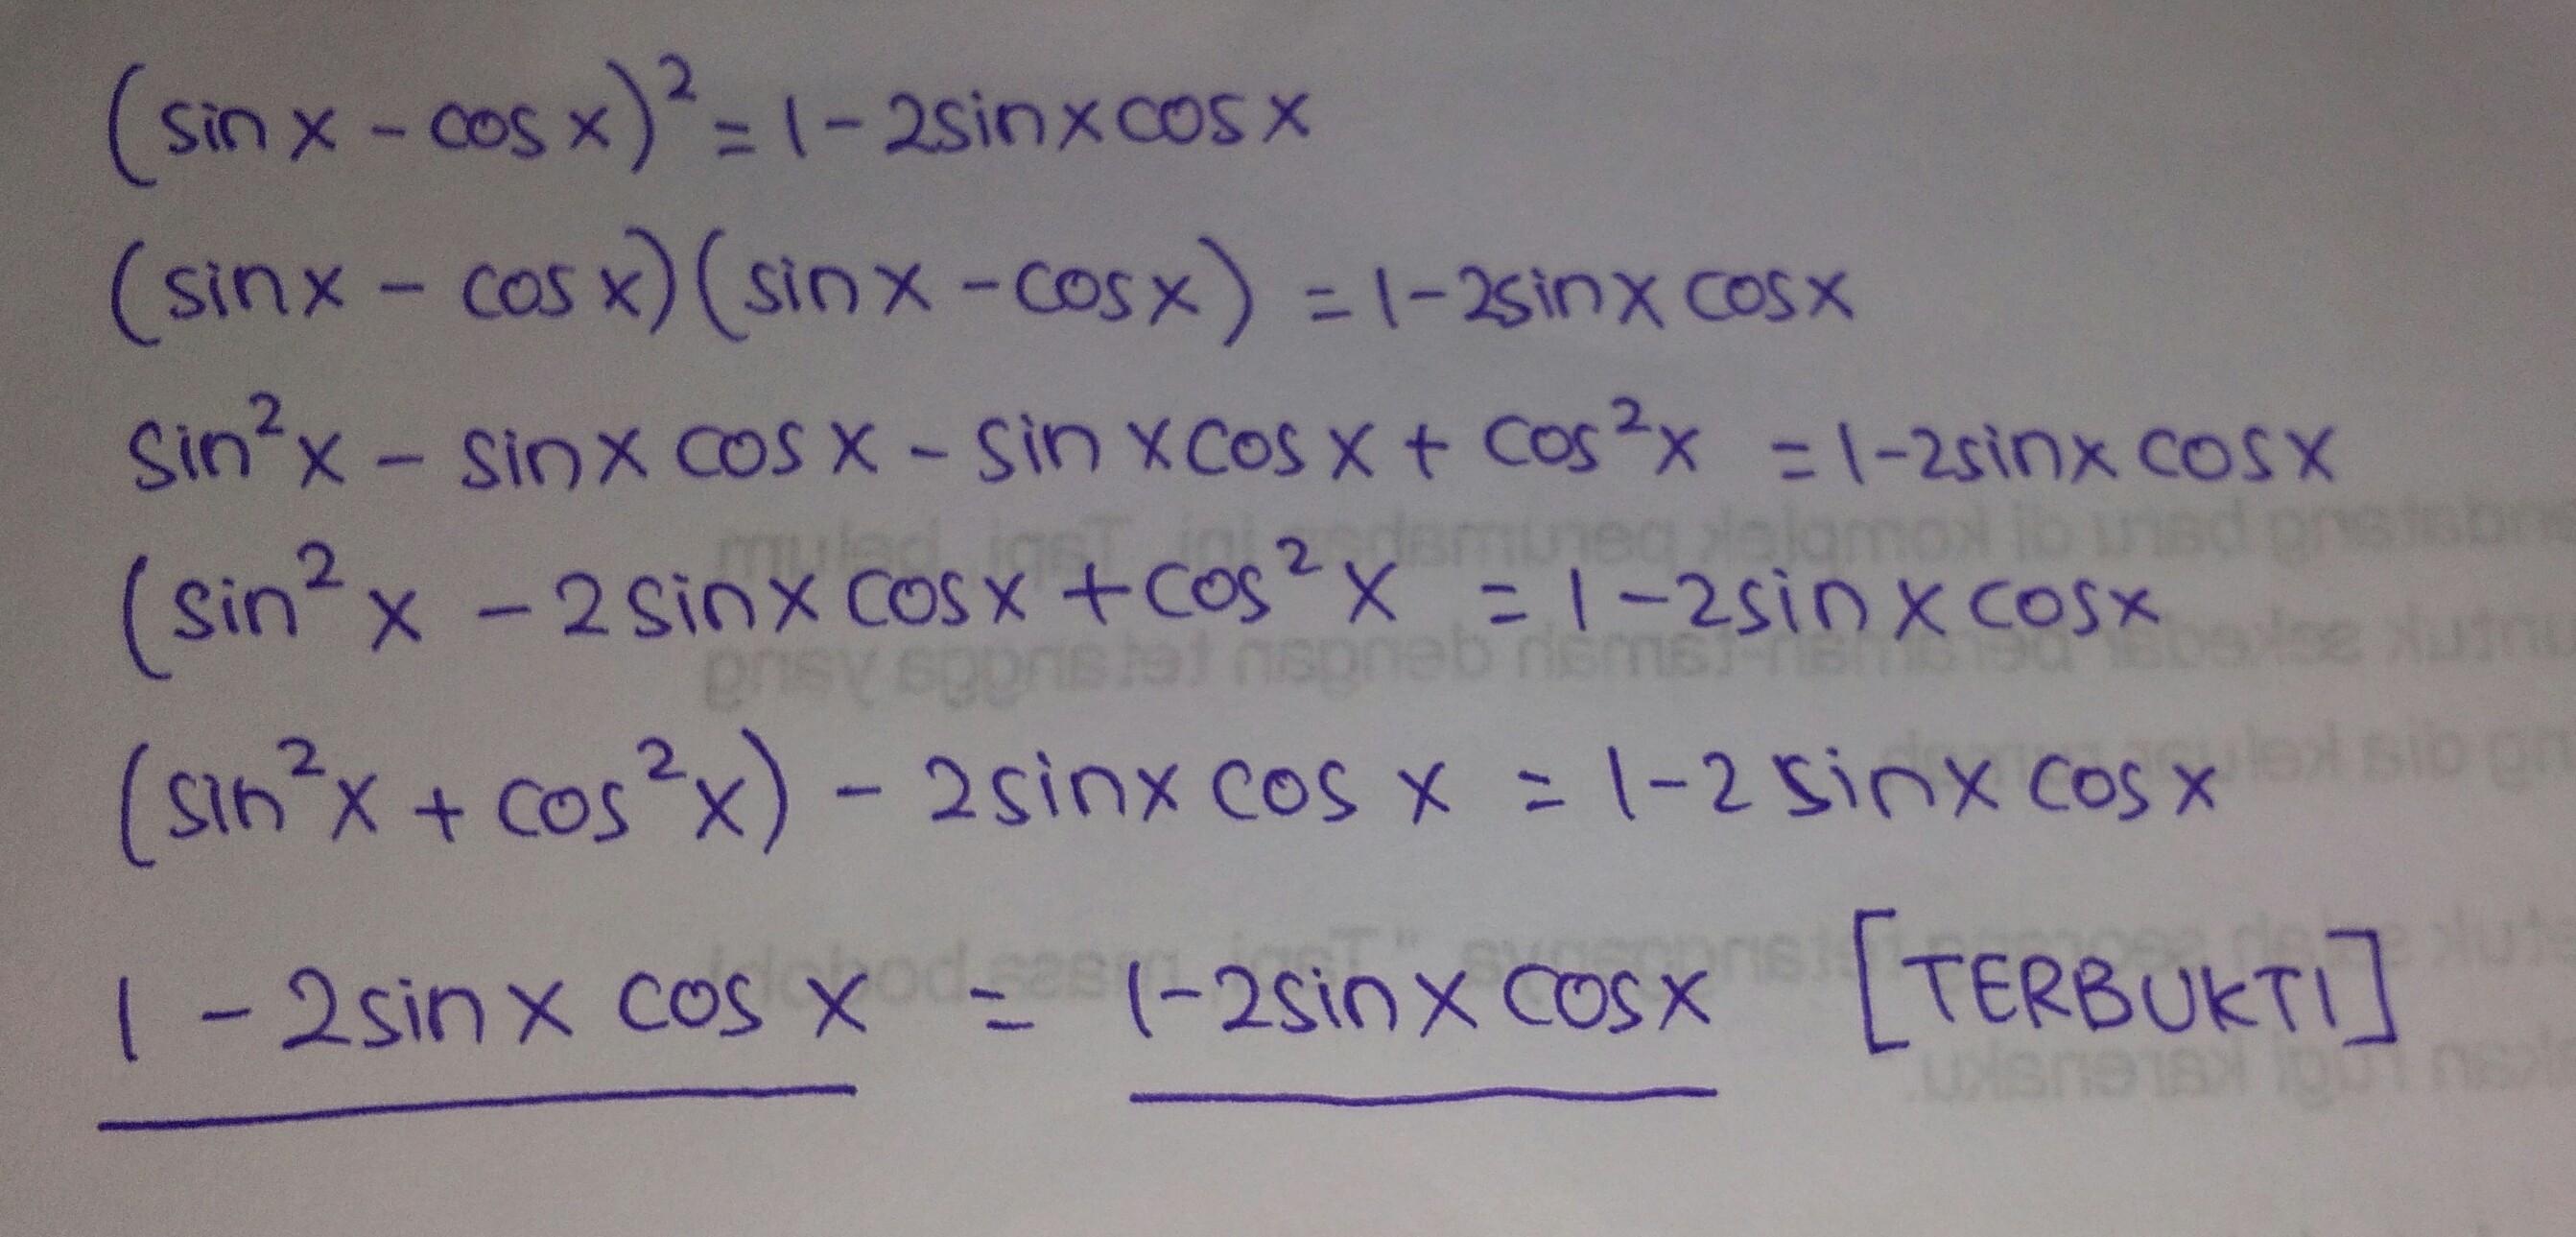 Buktikanlah Identitas Trigonometri Sin X Cos X 1 2 Sin X Cos X Brainly Co Id